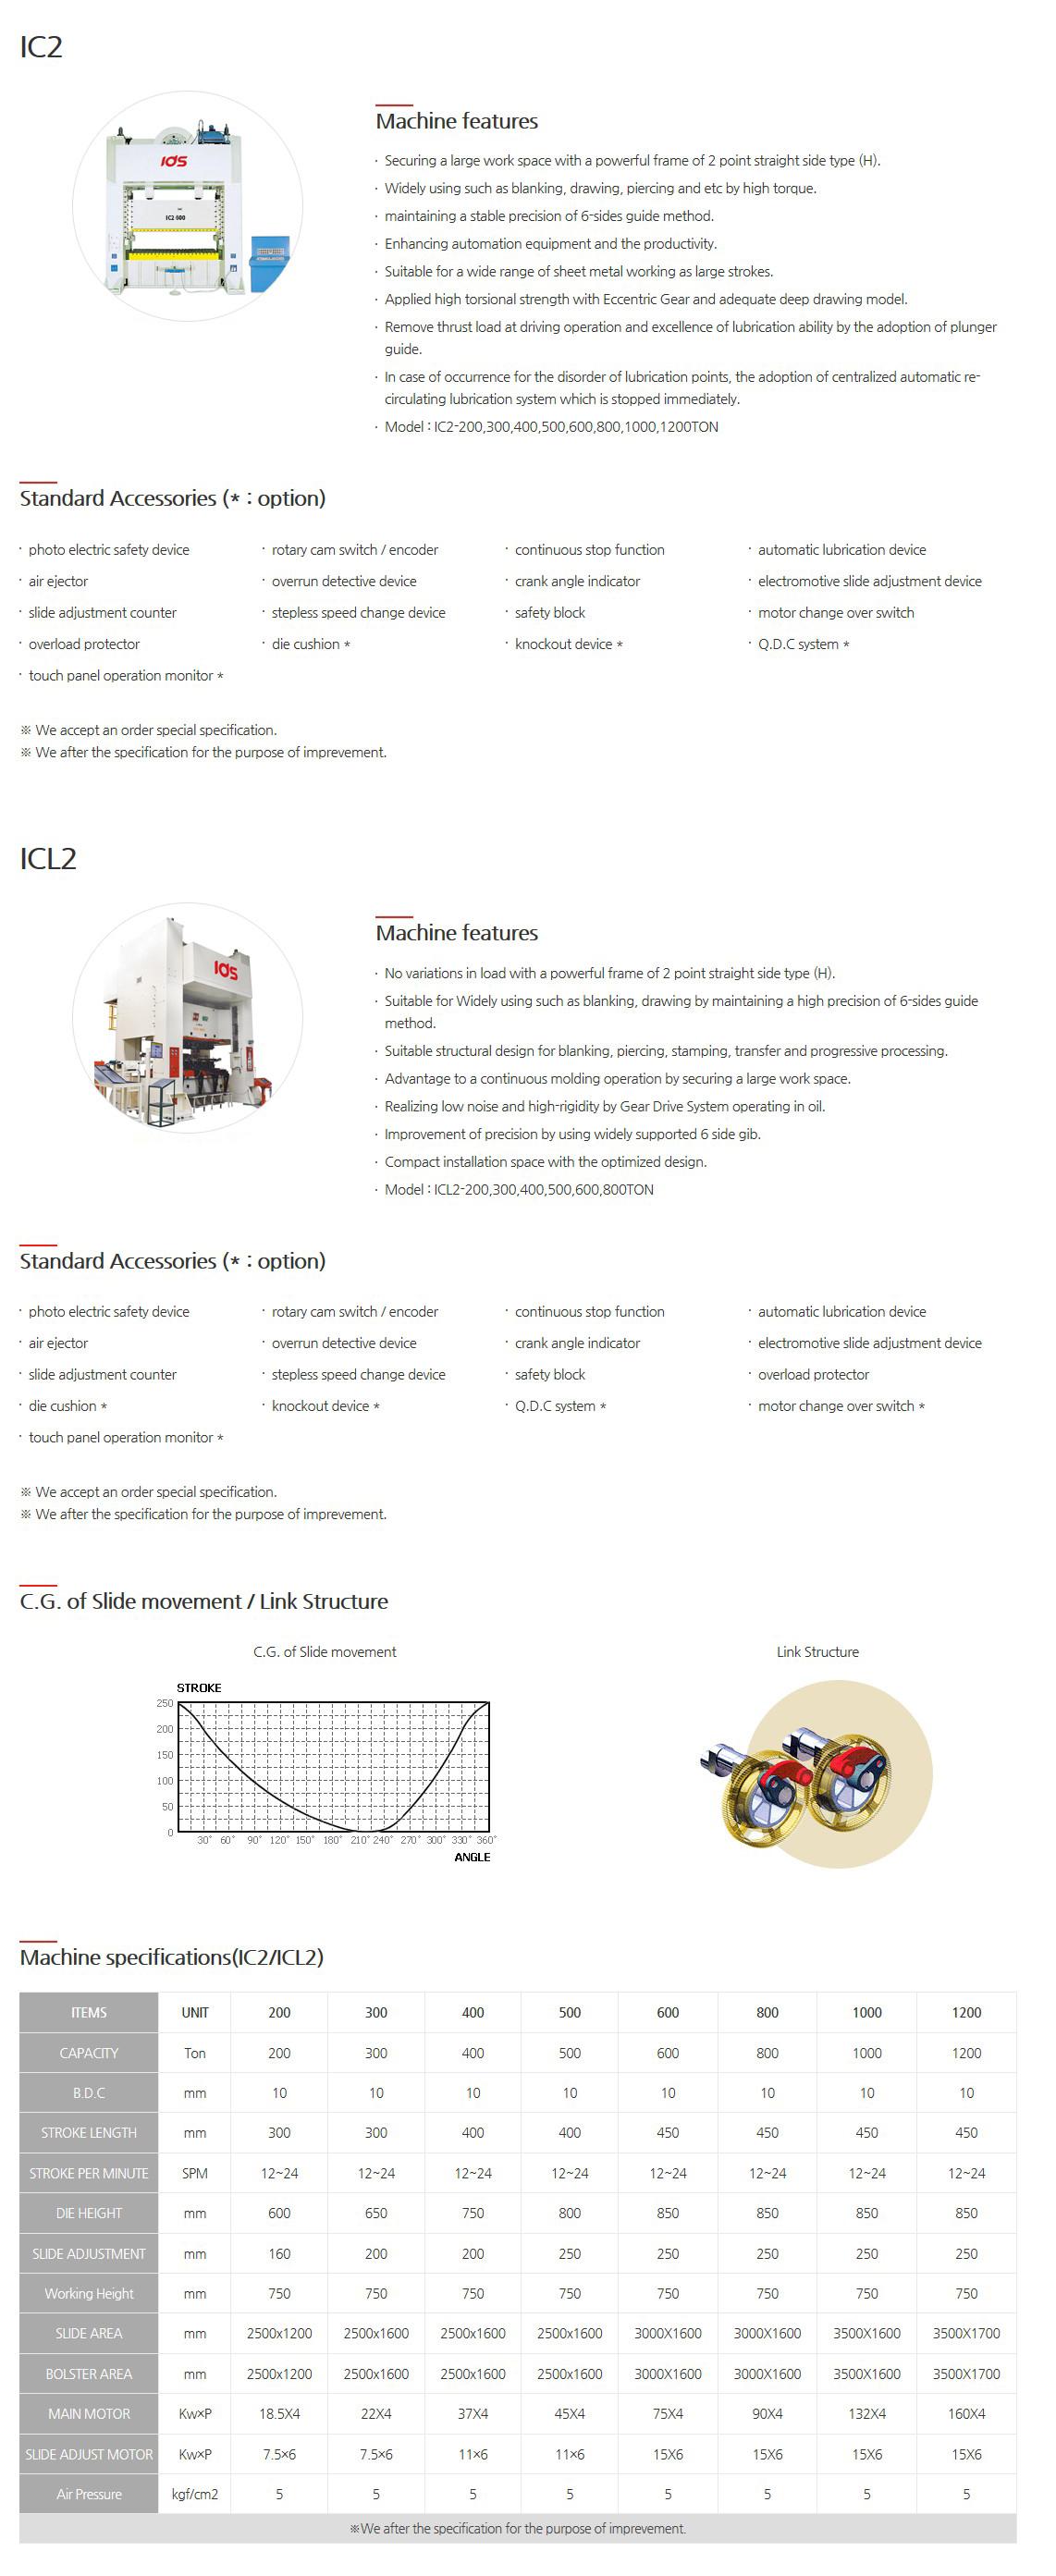 IDS PRESS Mechanical Presses (H-Type Press) IC2, ICL2